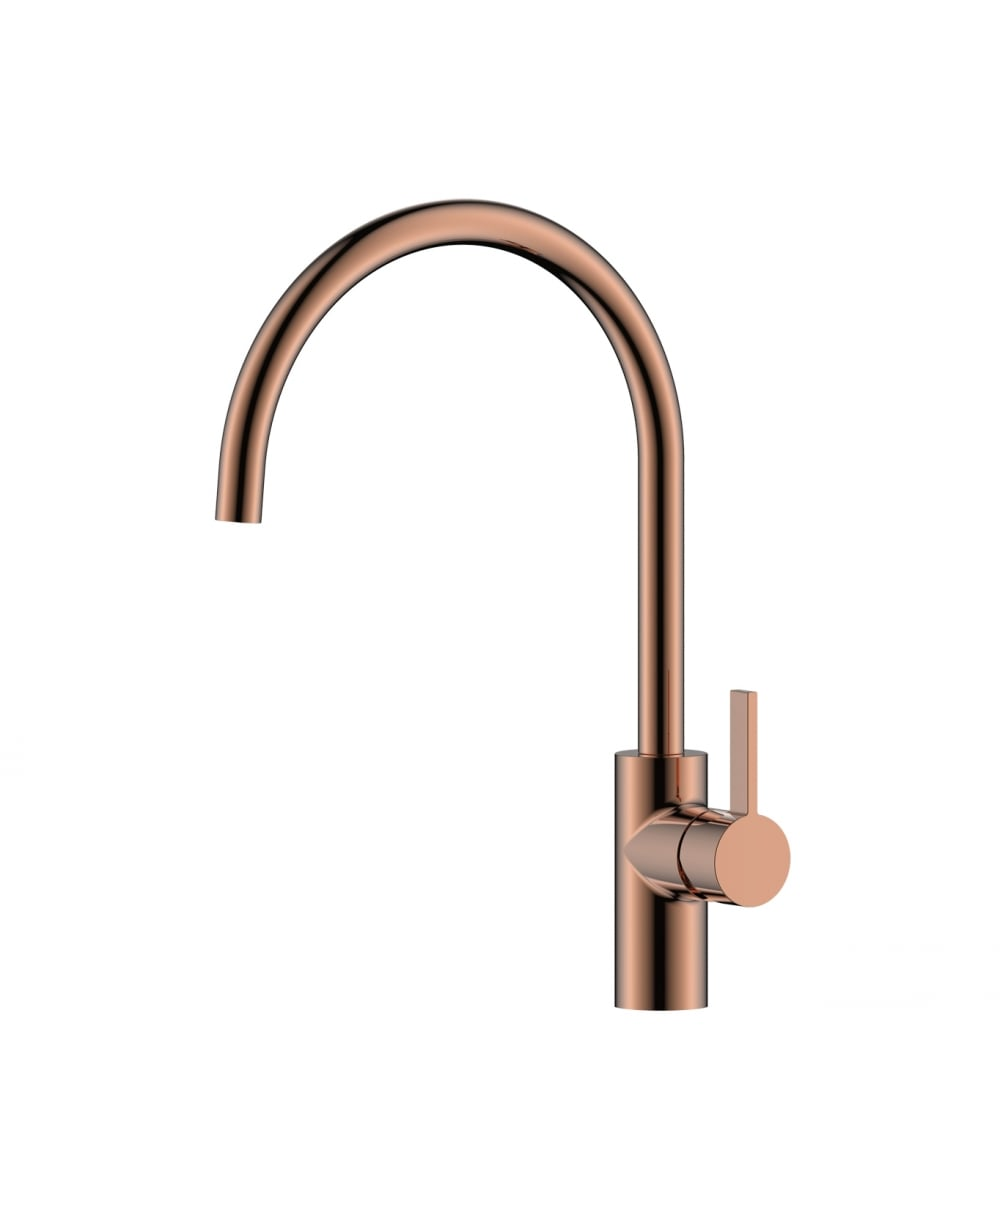 Single Lever Kitchen Sink Mixer - Rose Gold